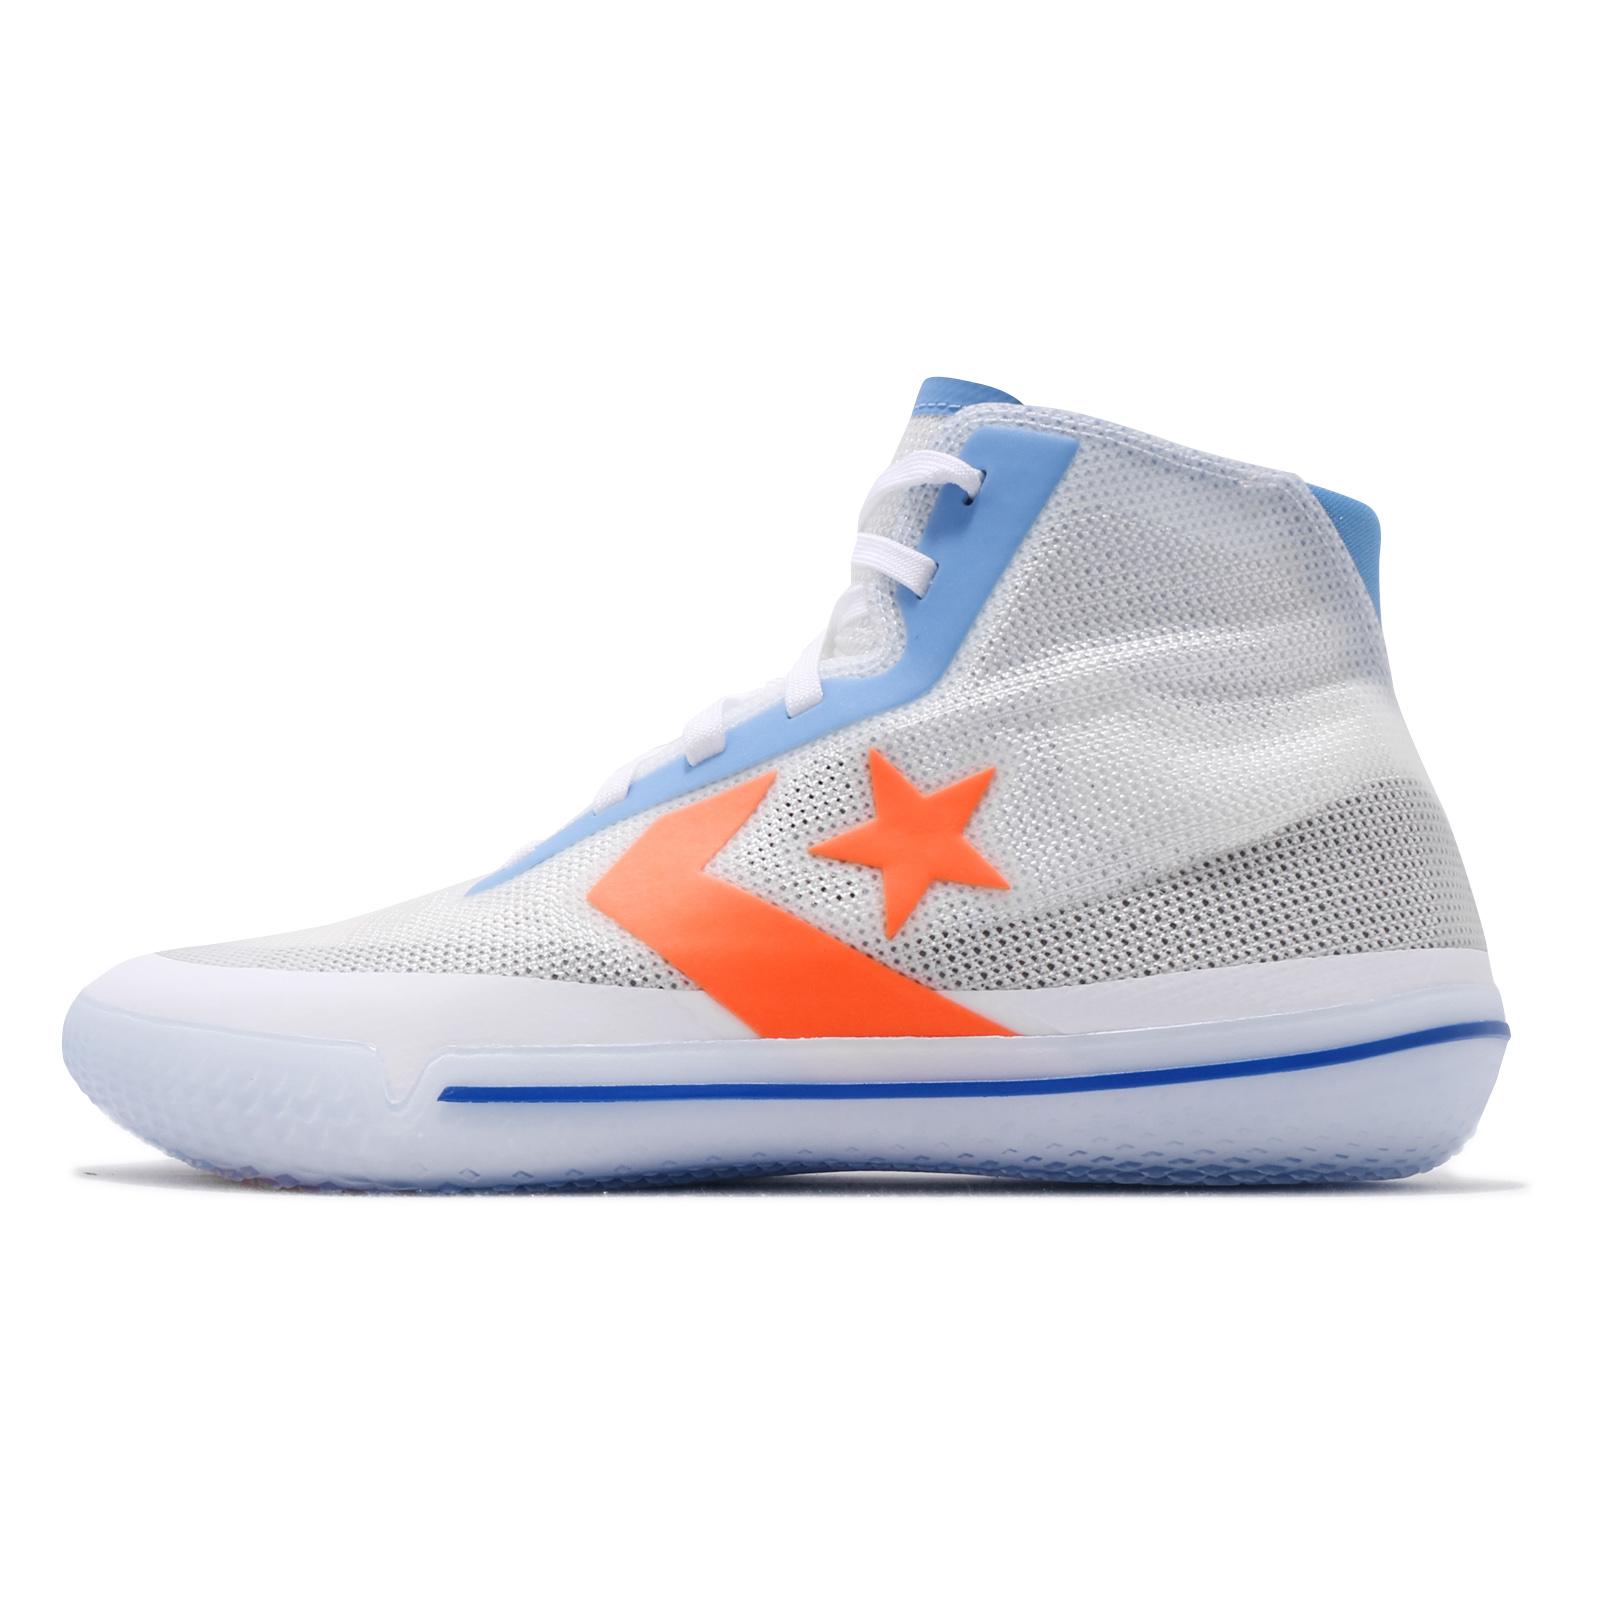 Converse 籃球鞋 All Star Pro BB Solstice 白 橘 藍 男鞋 【ACS】 167936C